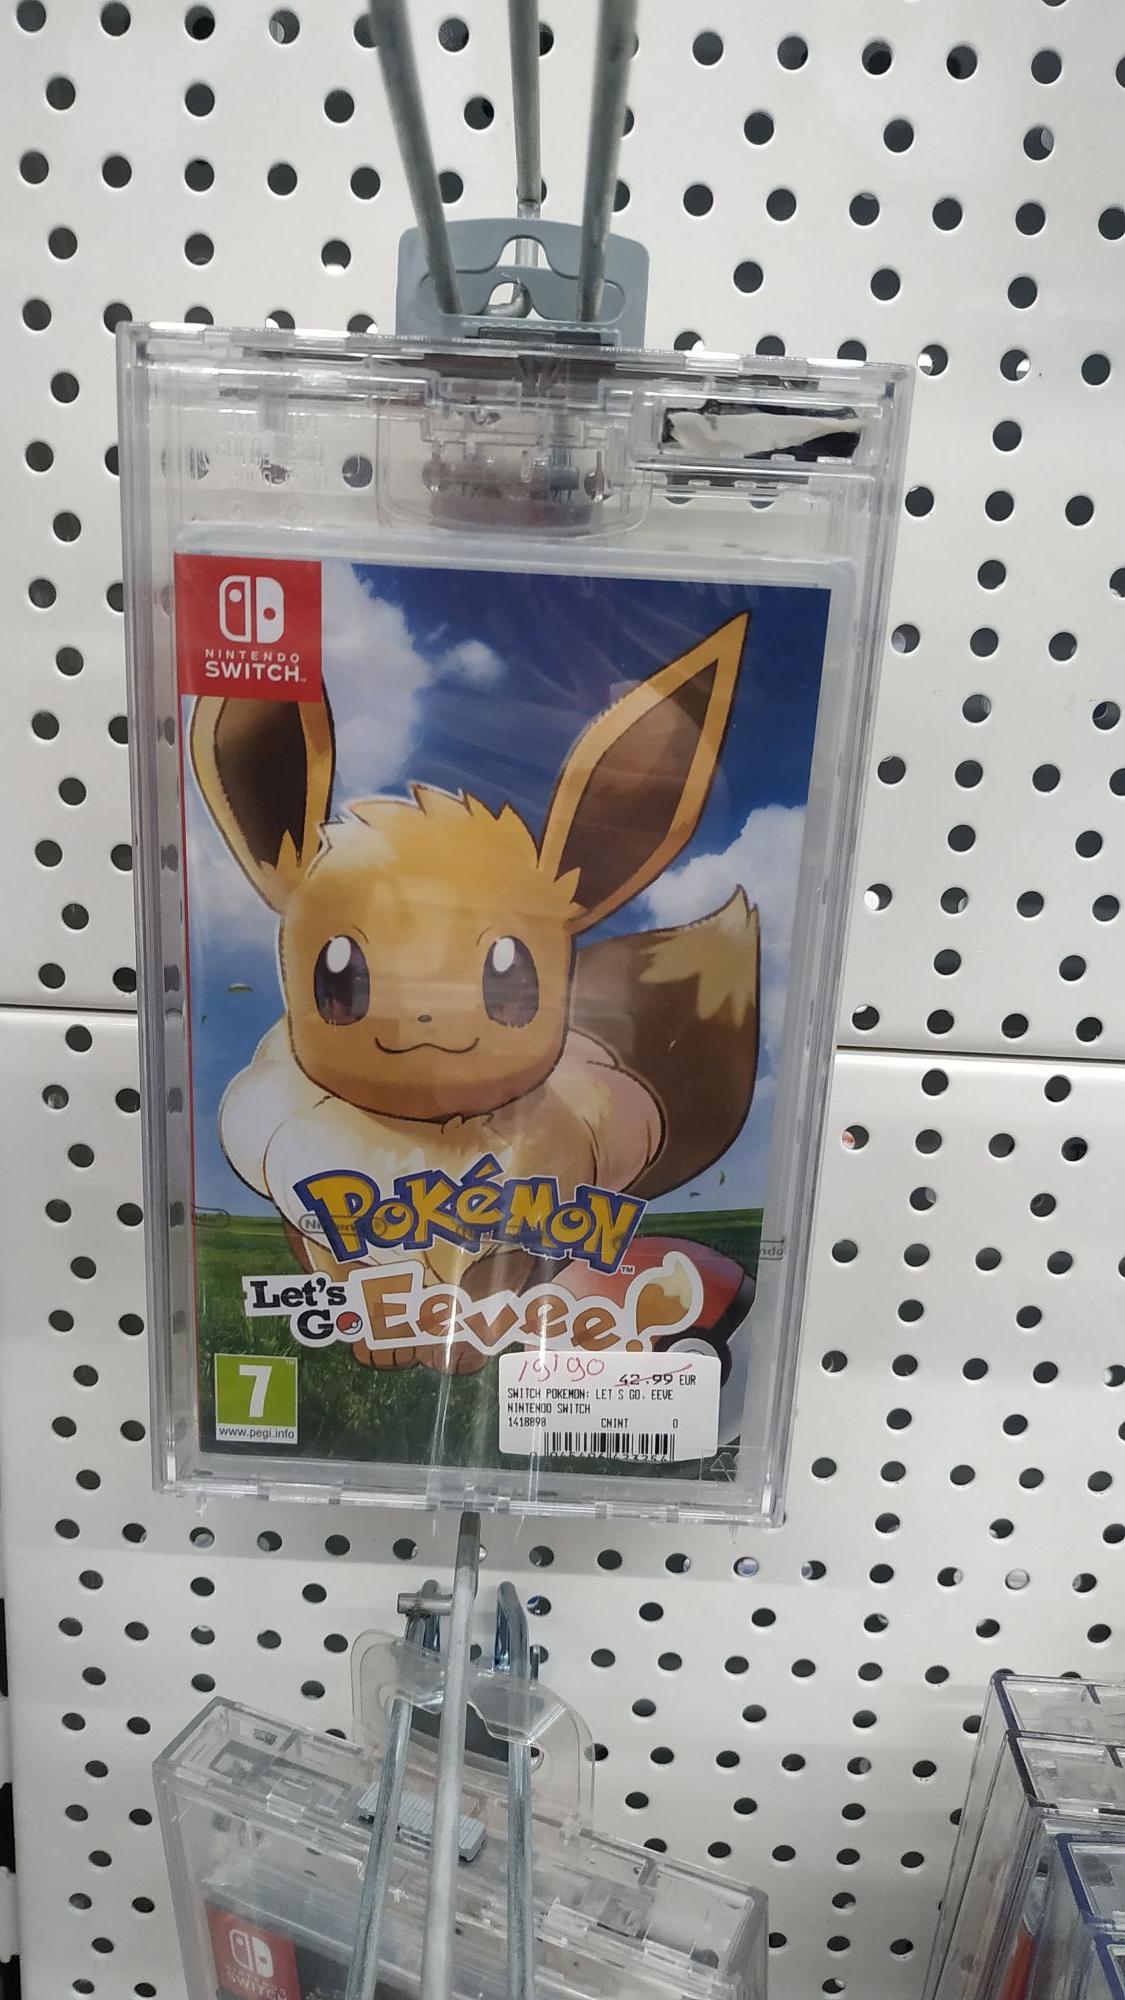 Pokémon Let's GO Eevee (Vista Hermosa)